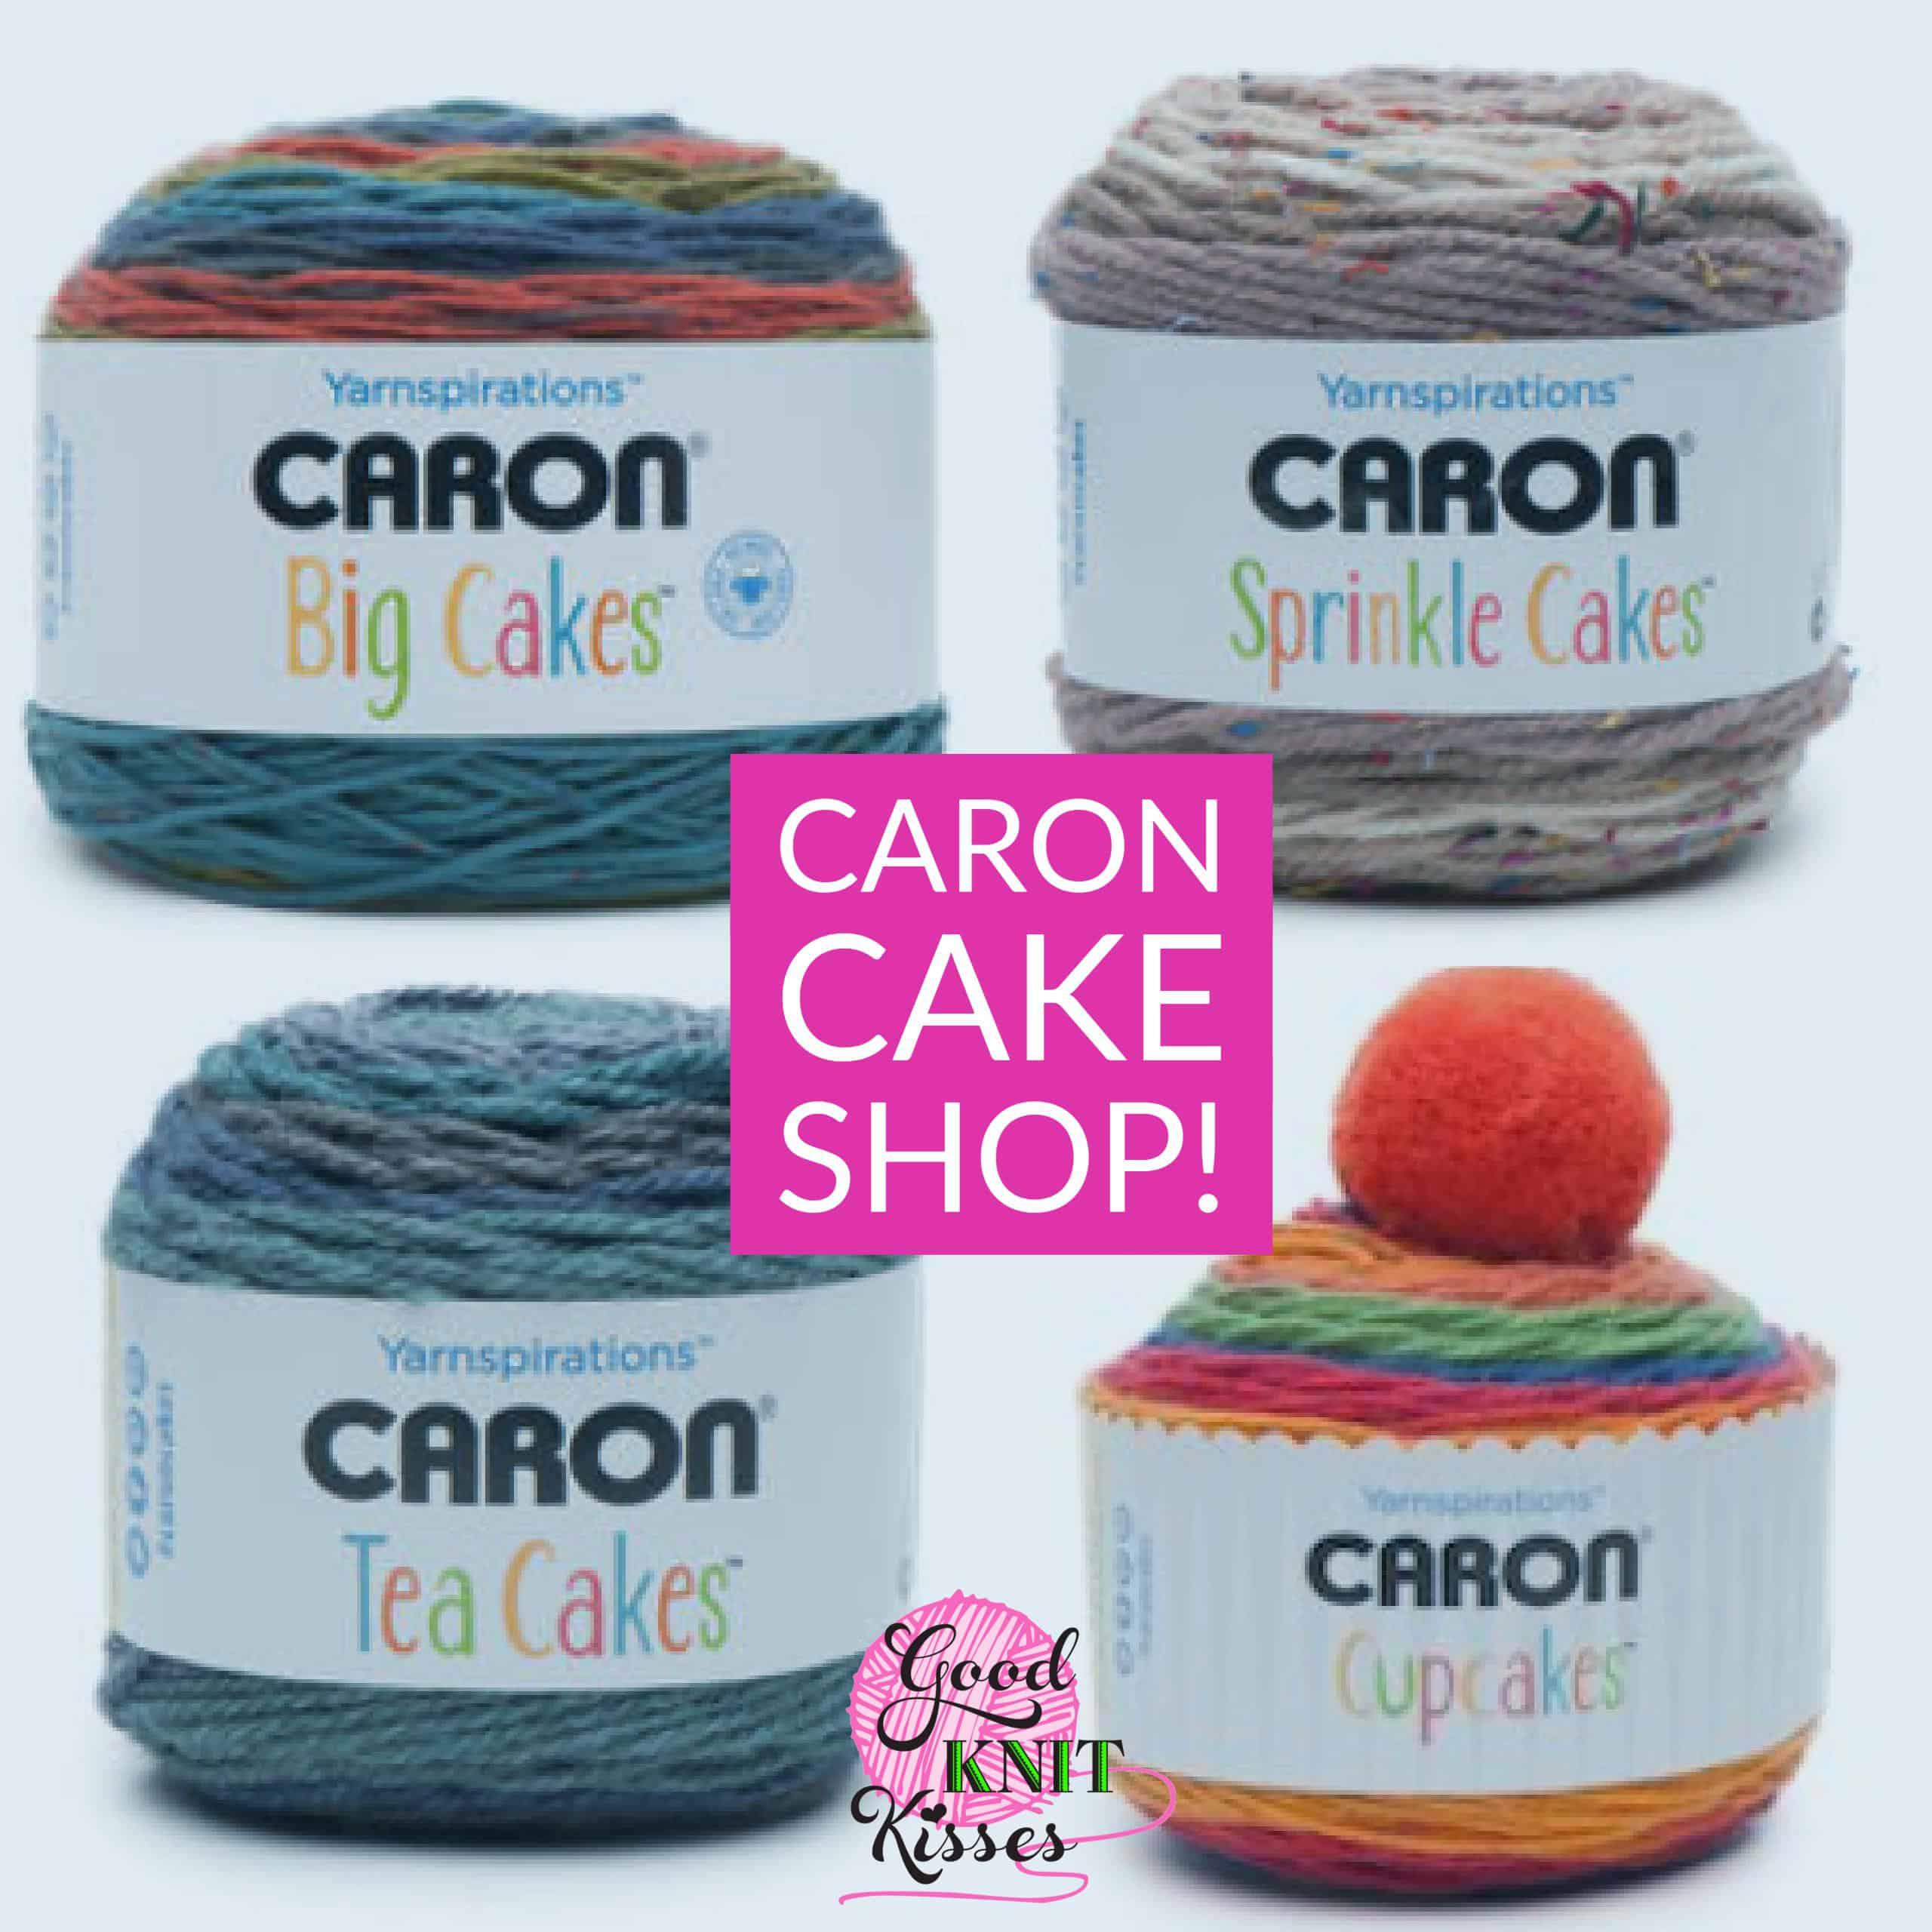 Caron Cake Shop *NEW Yarn* | GoodKnit Kisses